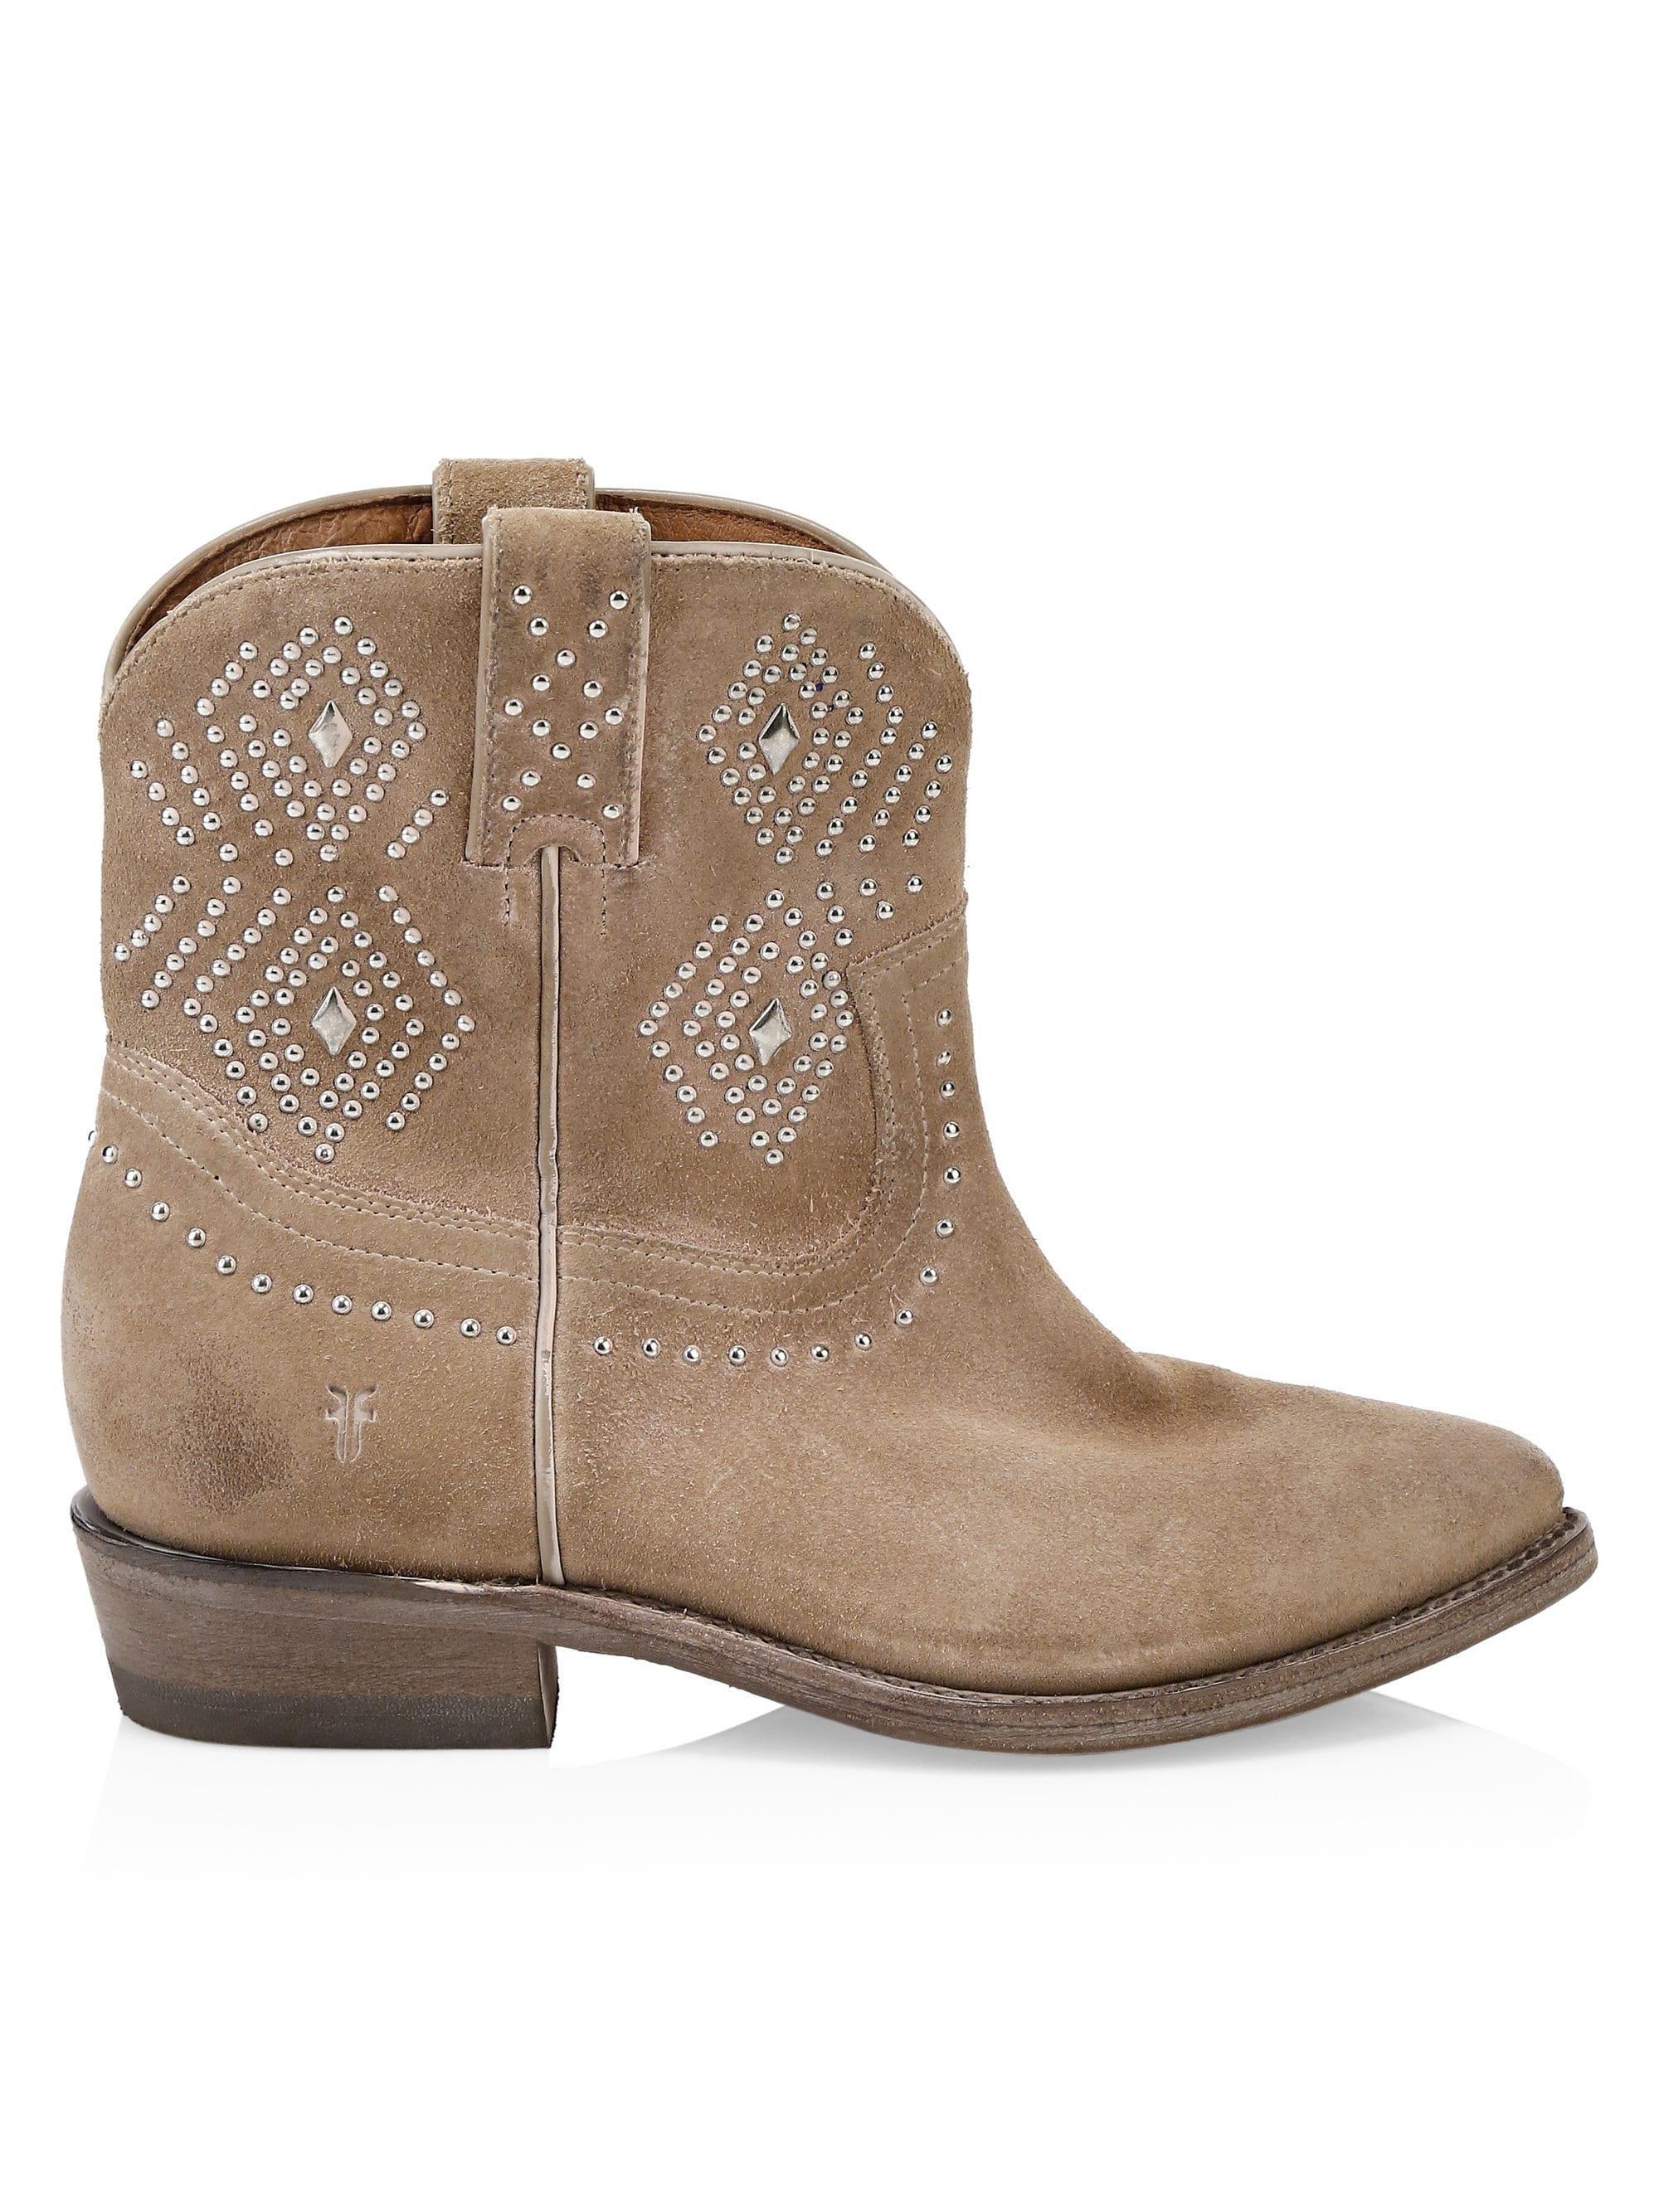 5921f615c1e Lyst - Frye Women's Billy Studded Suede Short Cowboy Boots - Tan ...